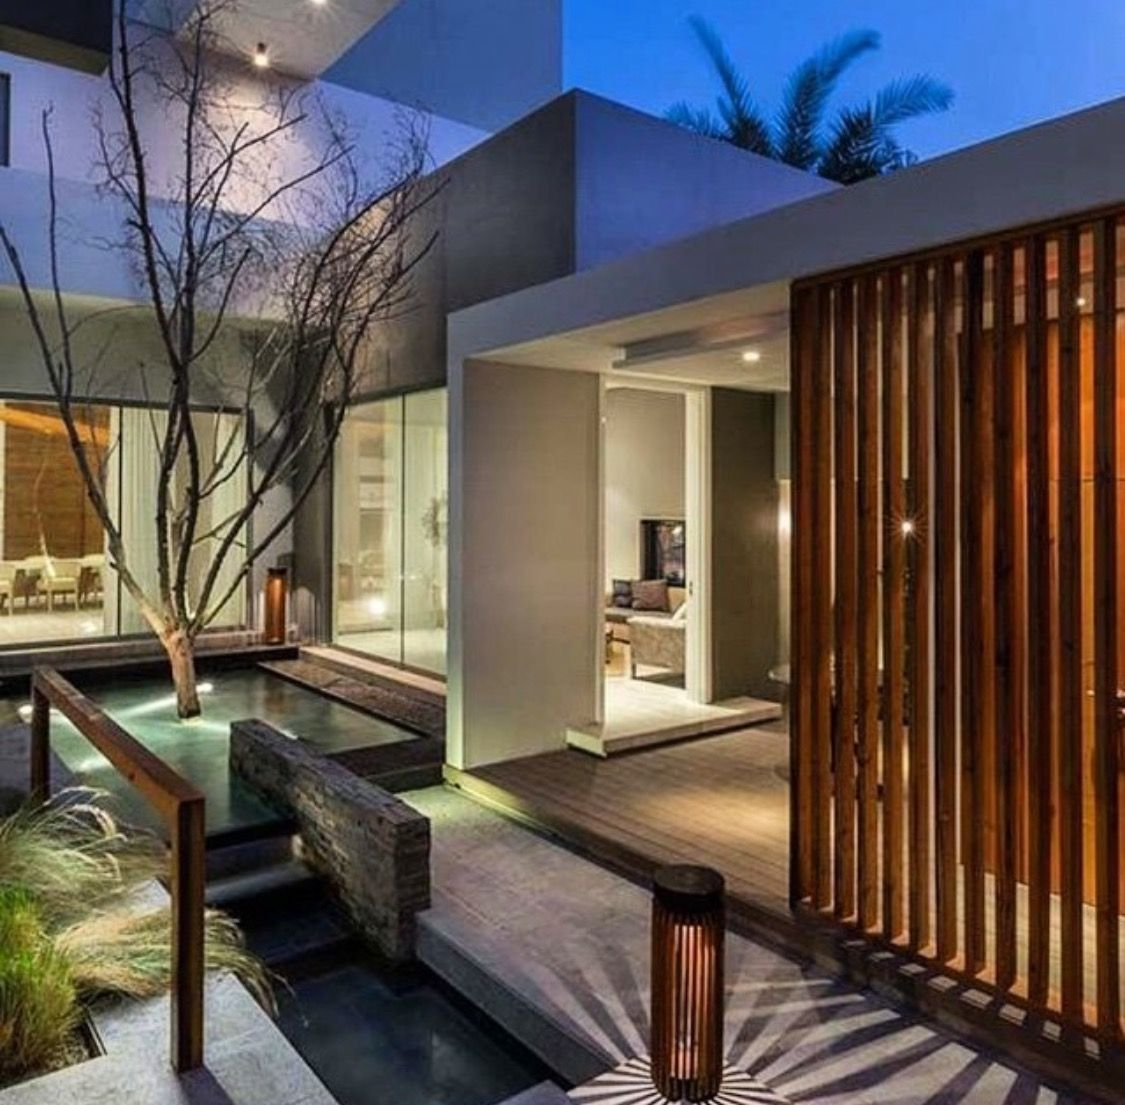 DJ Zedd Buys Spectacular Canyon Home In LA For $16 Million | Minimalist  Architecture, Minimalist And Walls